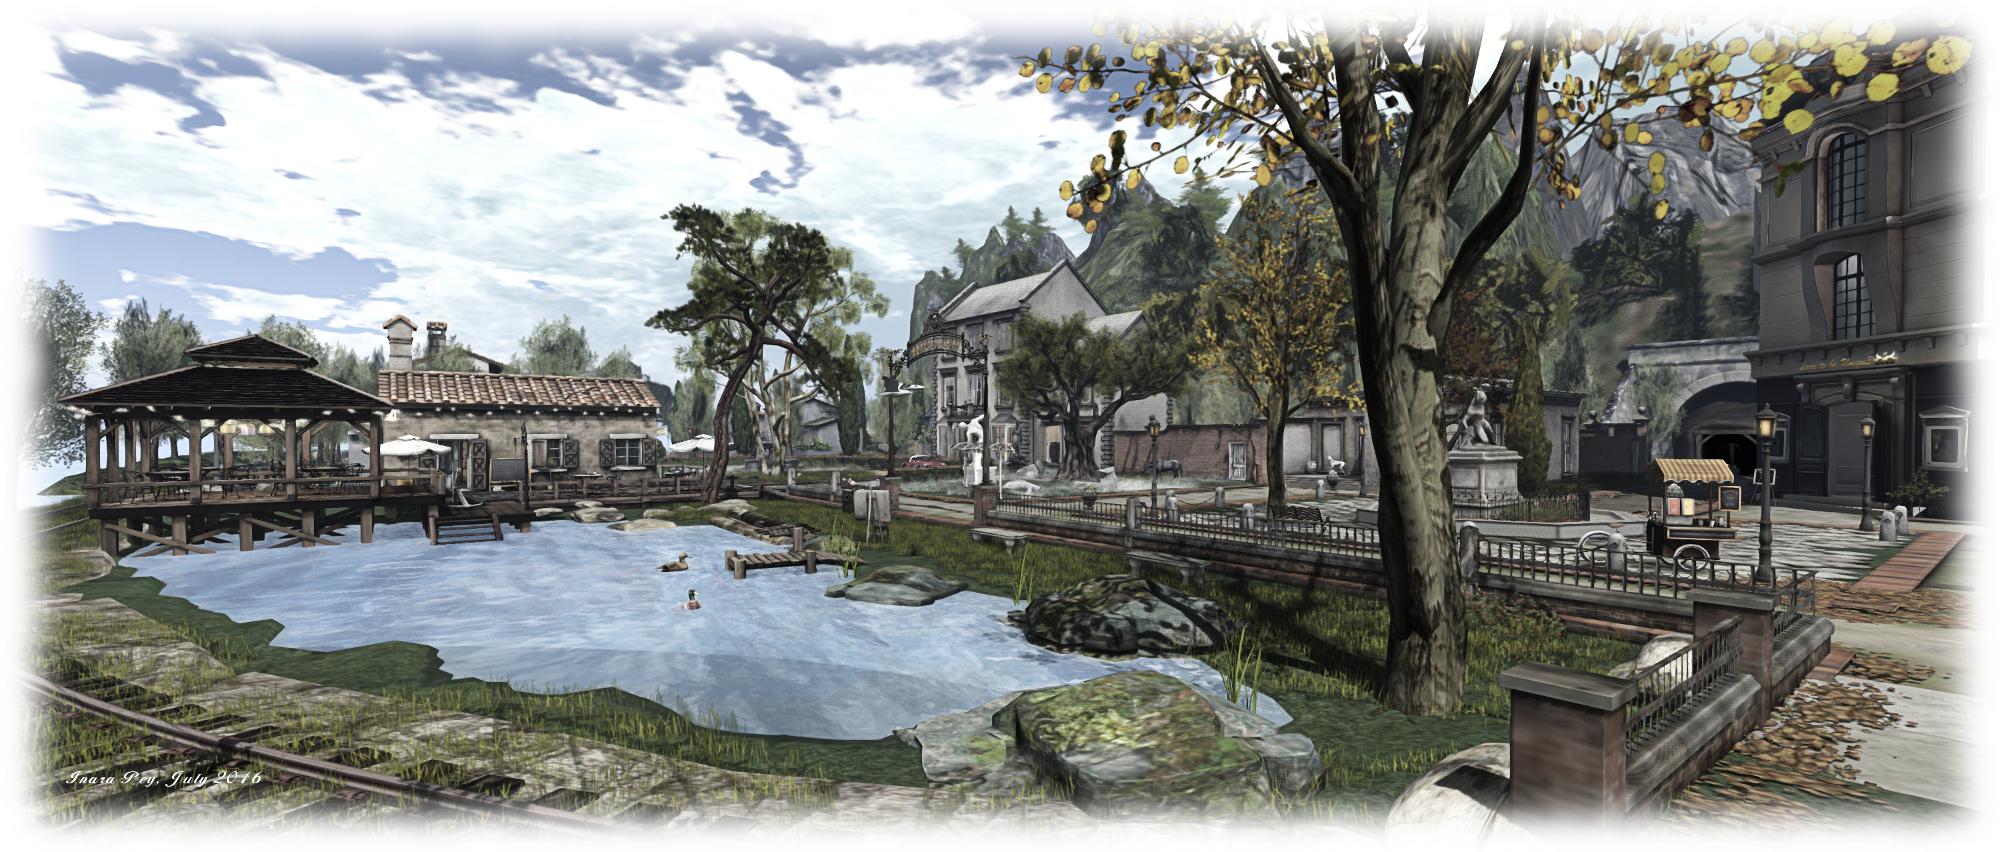 Hermoupolis Village; Inara Pey, July 2016, on Flickr